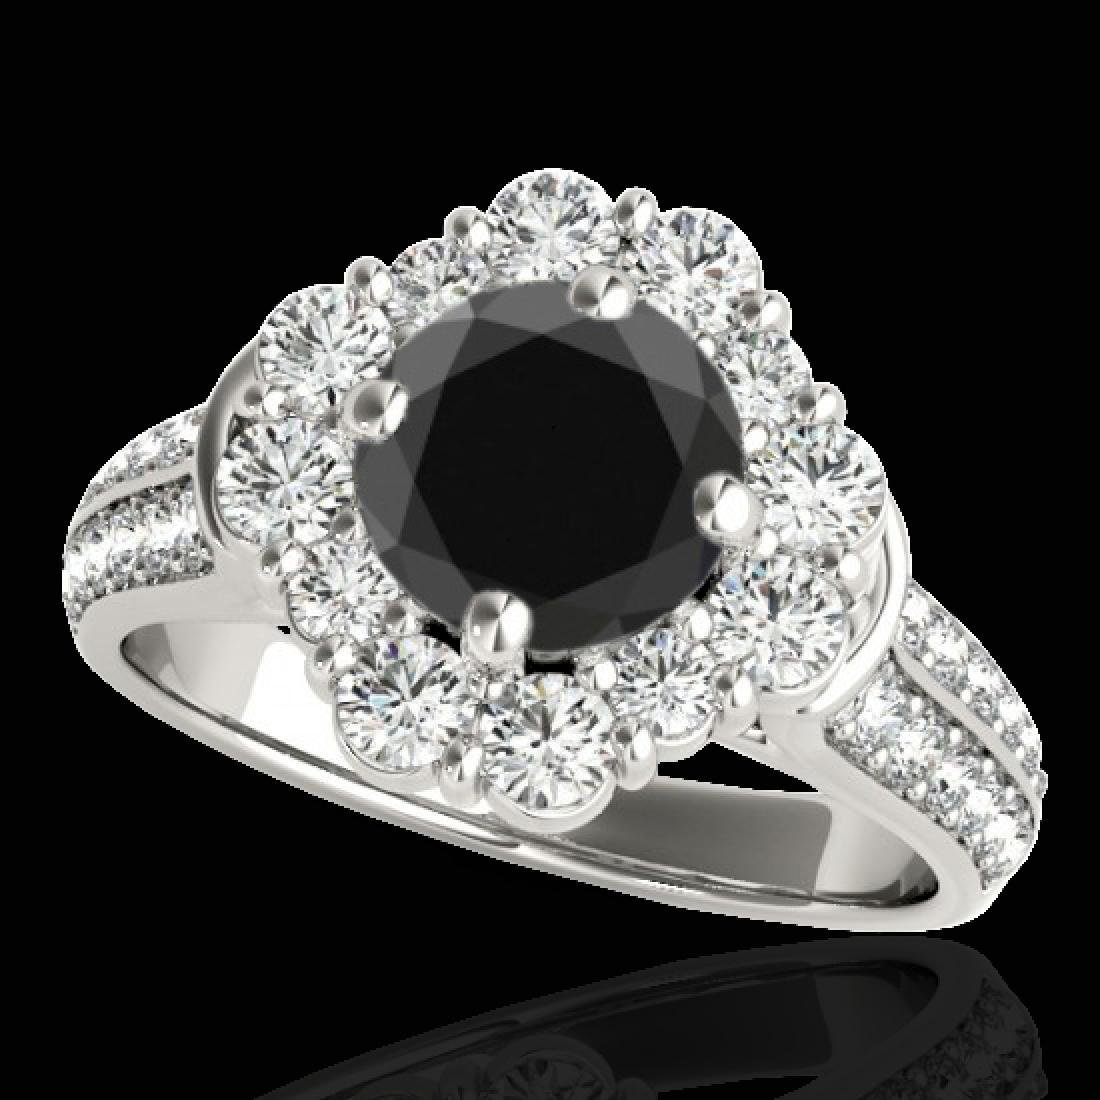 2.16 CTW Certified VS Black Diamond Solitaire Halo Ring